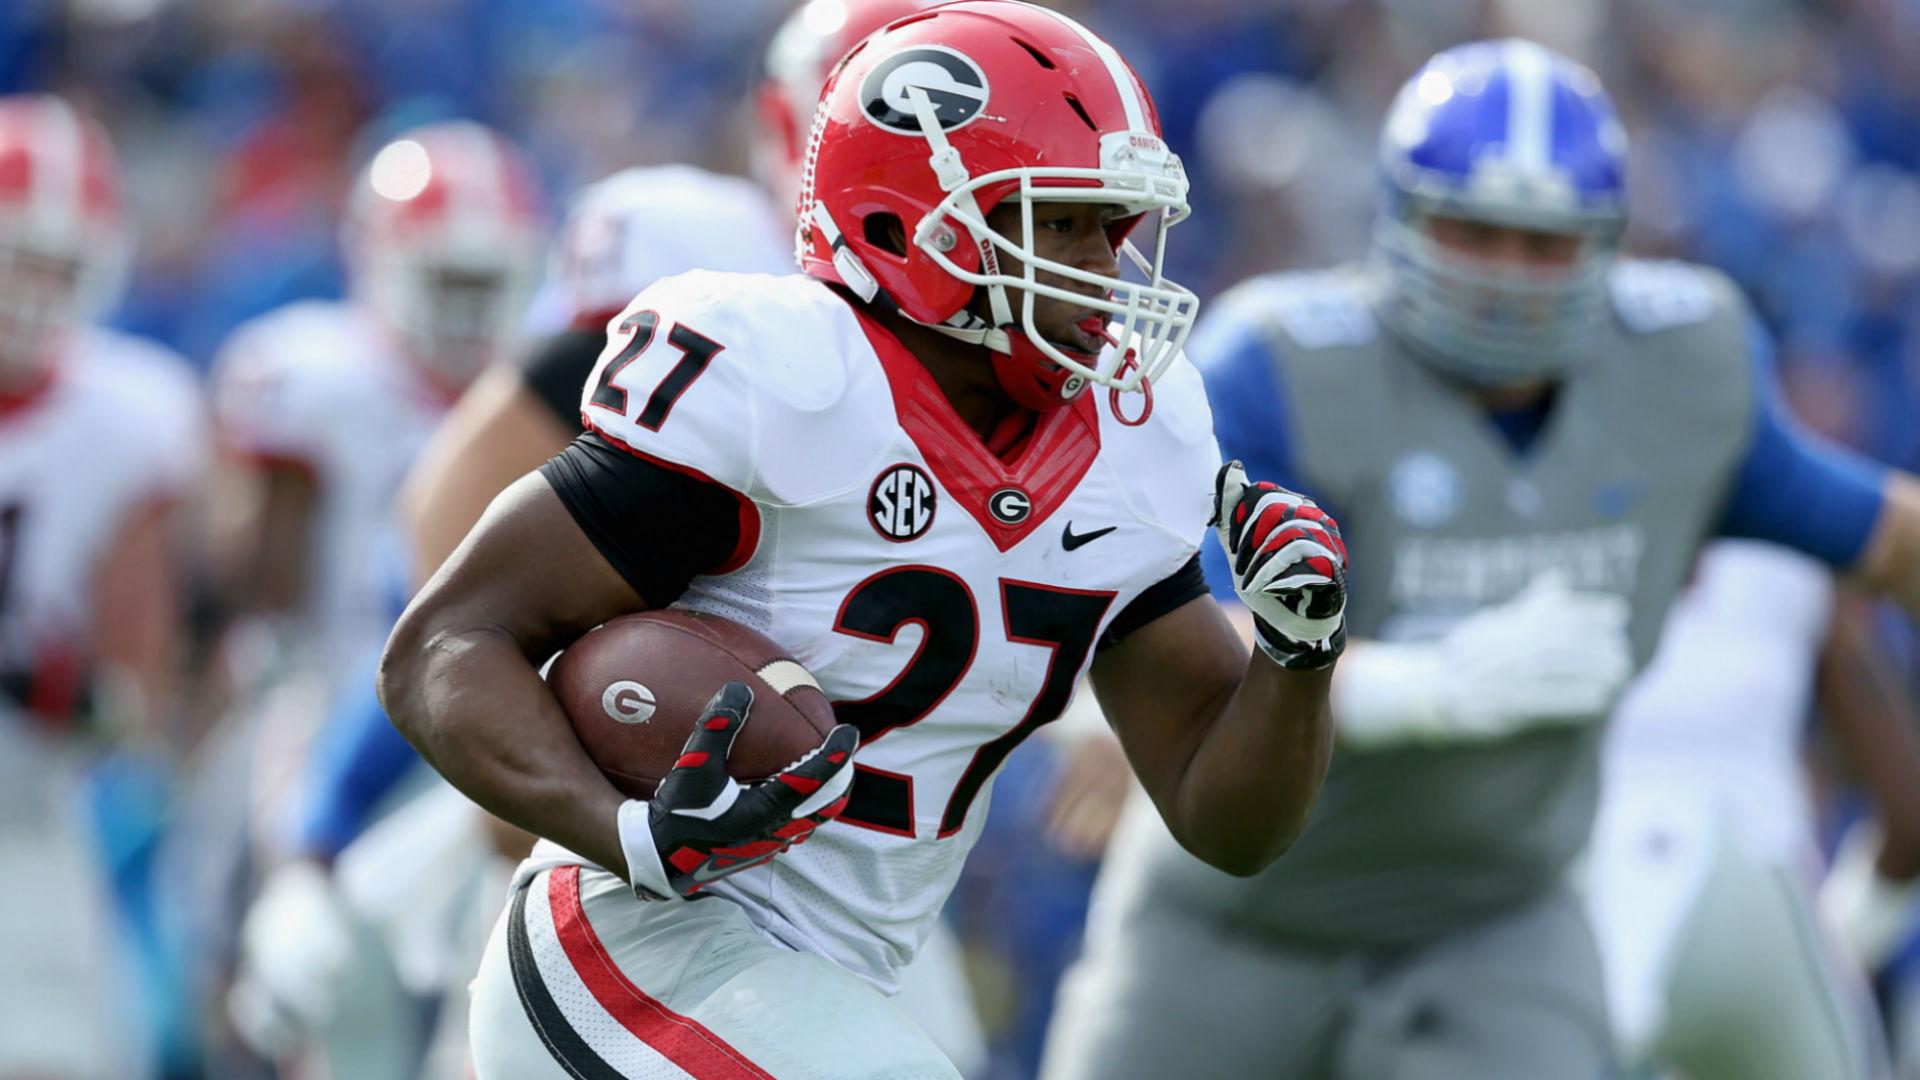 Georgia Tech vs. Georgia betting preview and pick – Bulldogs big favorites in state showdown